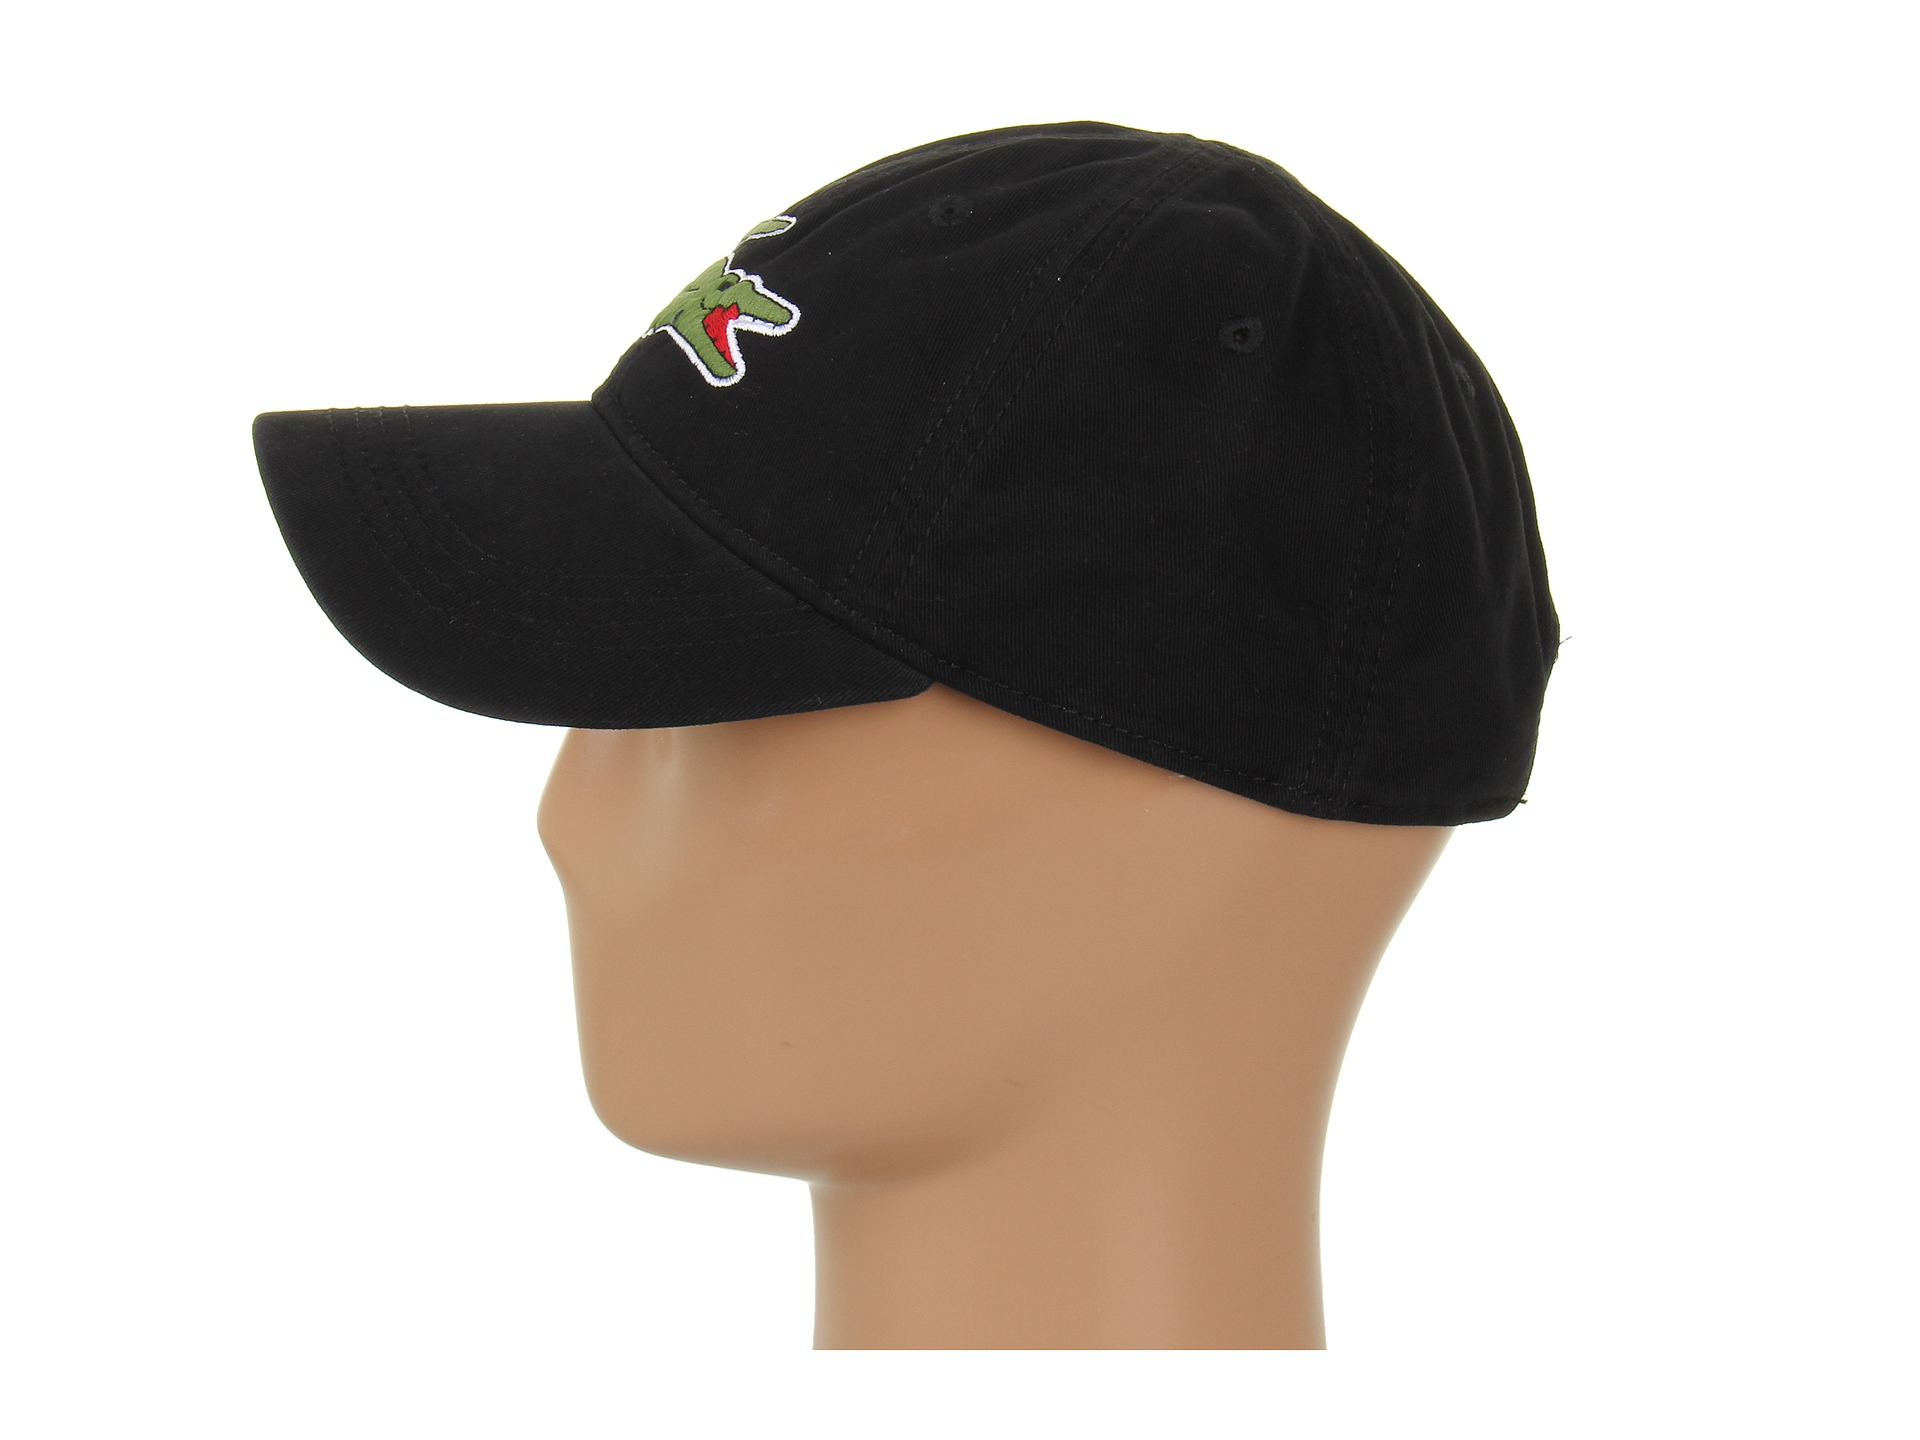 Lyst - Lacoste Large Croc Gabardine Cap in Black for Men bde0c245876